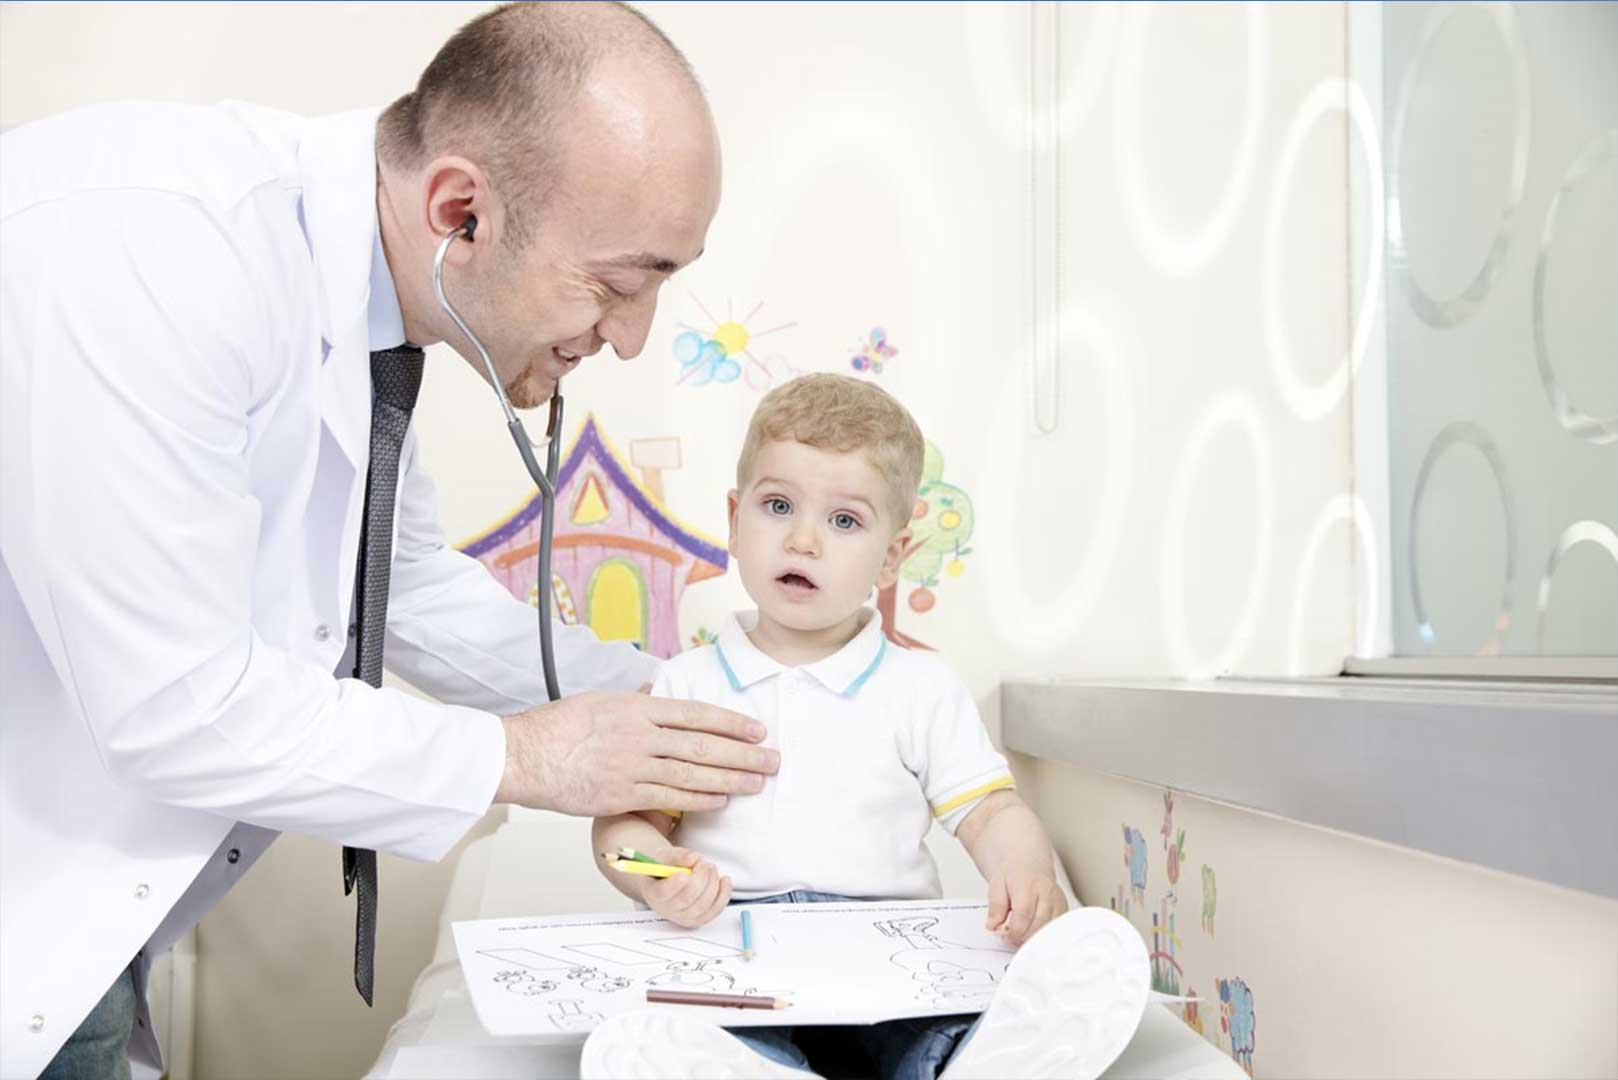 https://www.medicanahealthpoint.com/wp-content/uploads/2020/10/medicana-international-istanbul-12.jpg